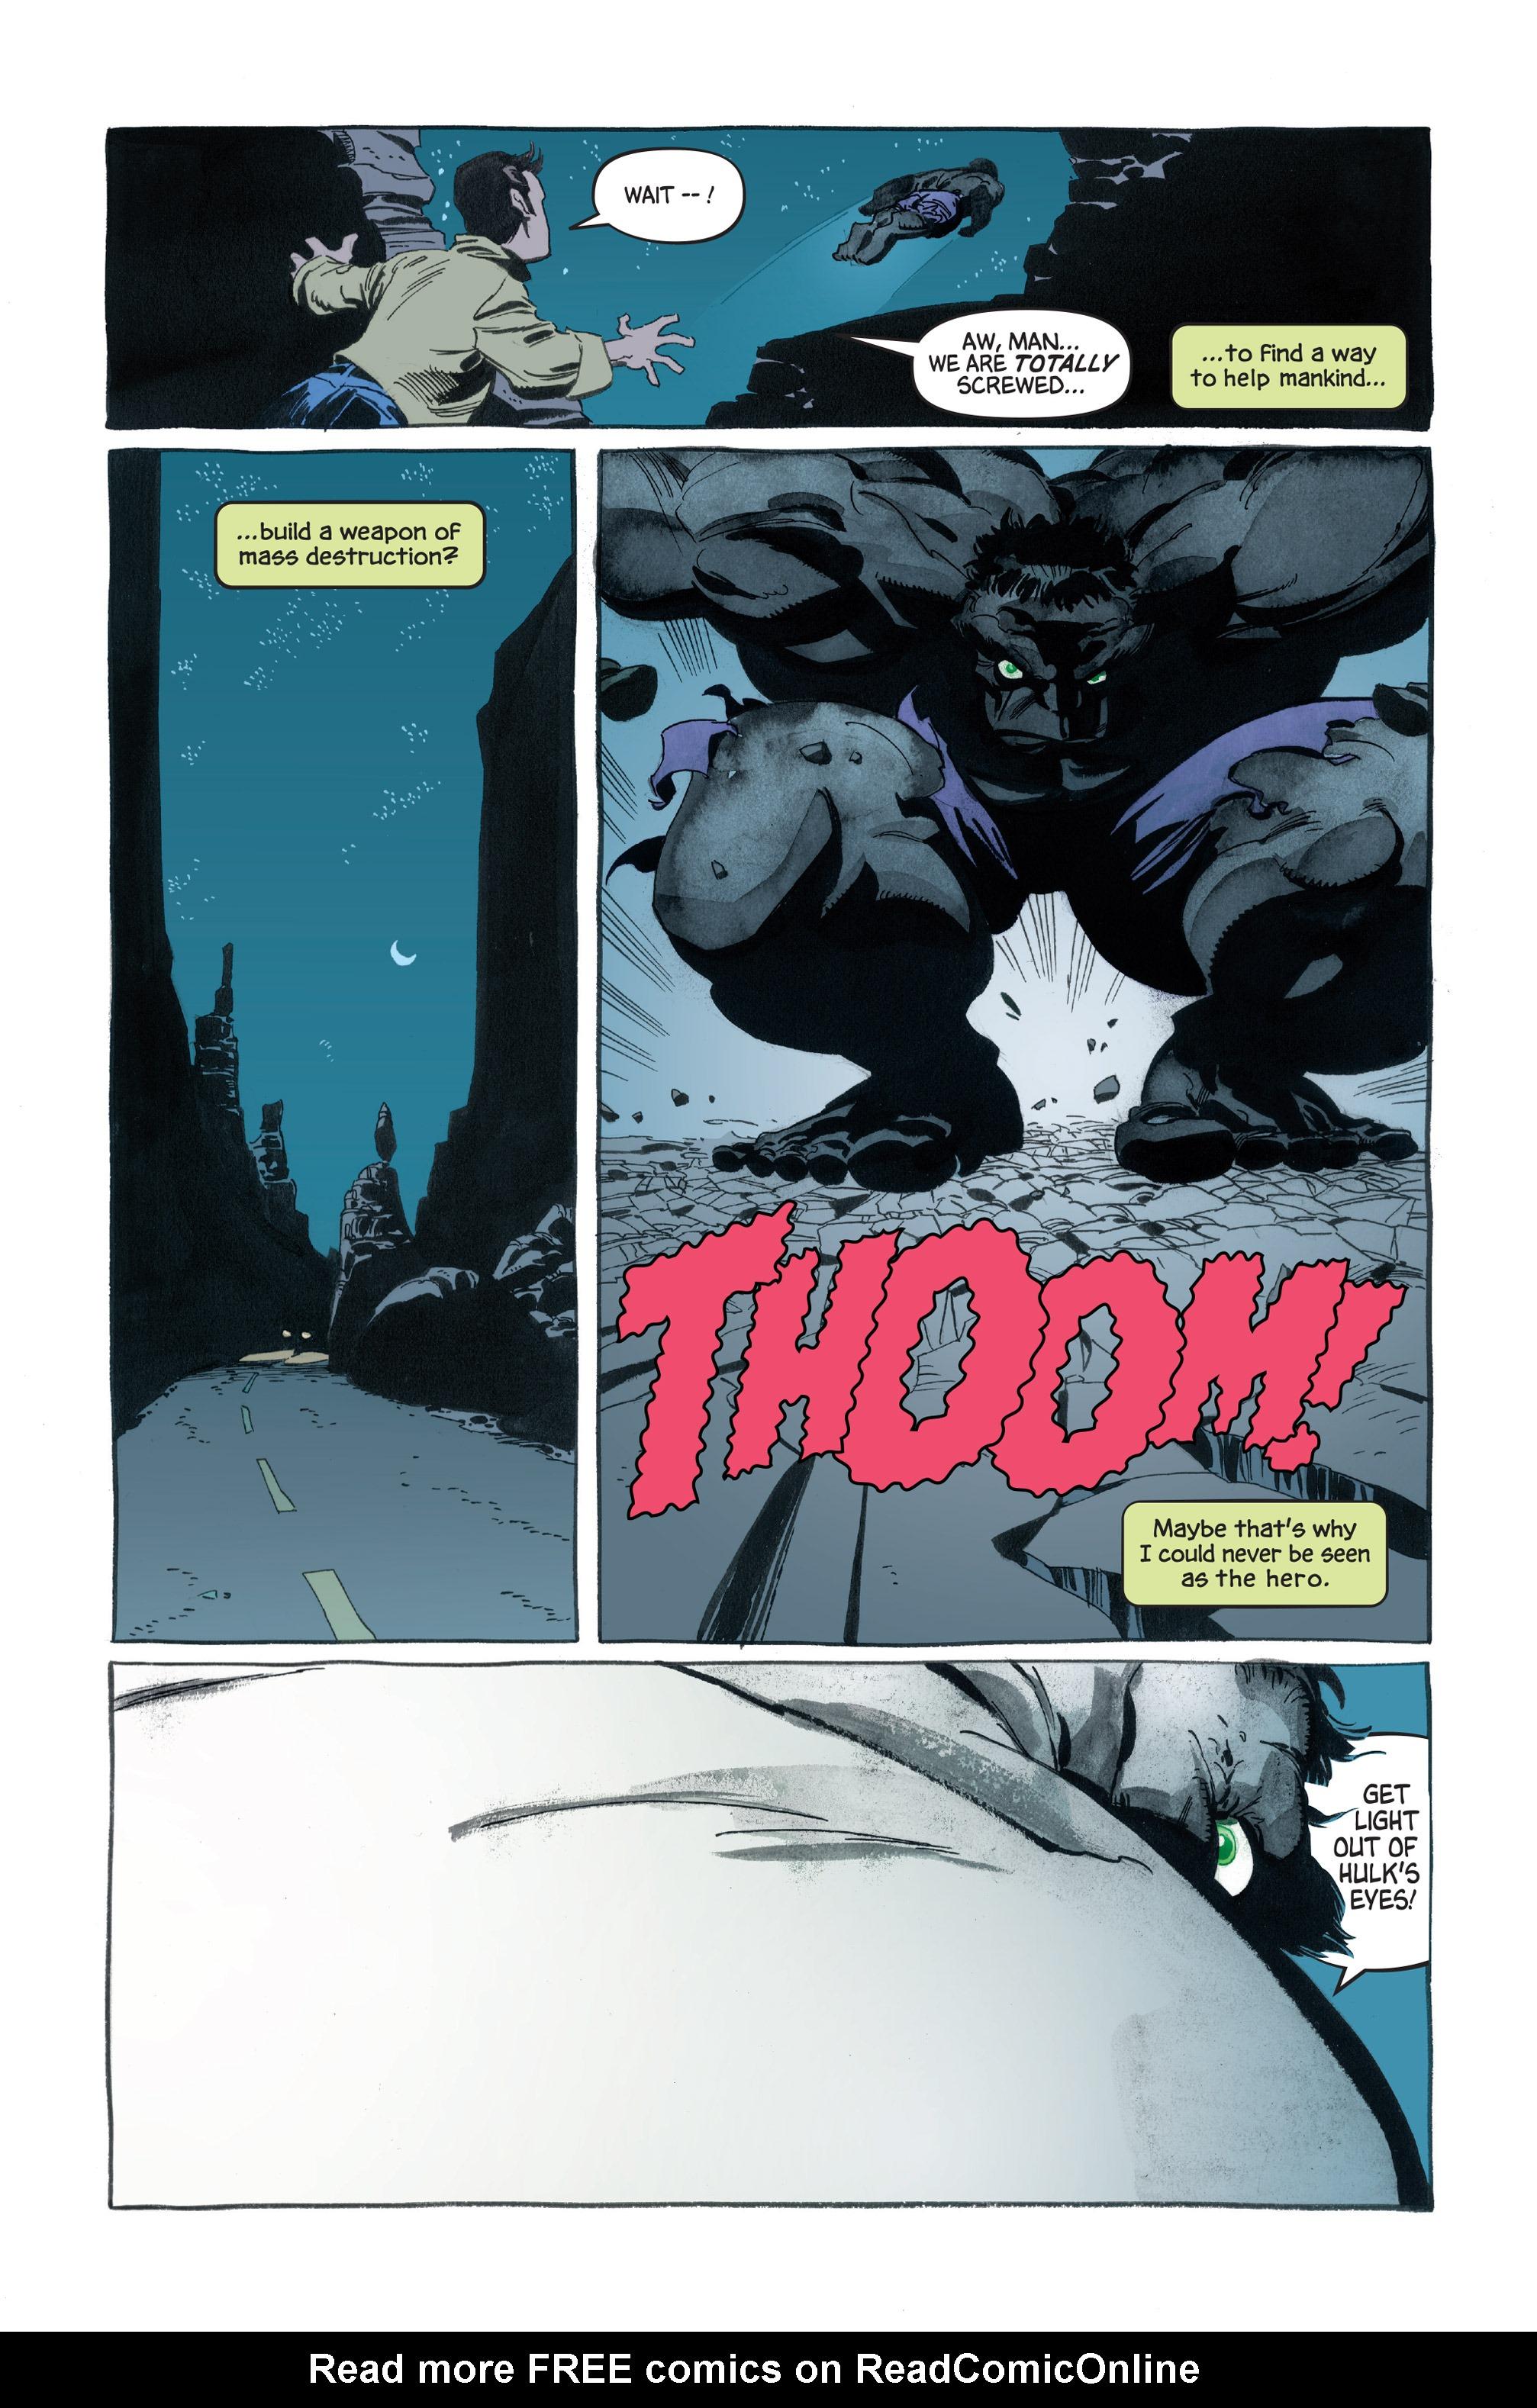 Read online Hulk: Gray comic -  Issue #1 - 16